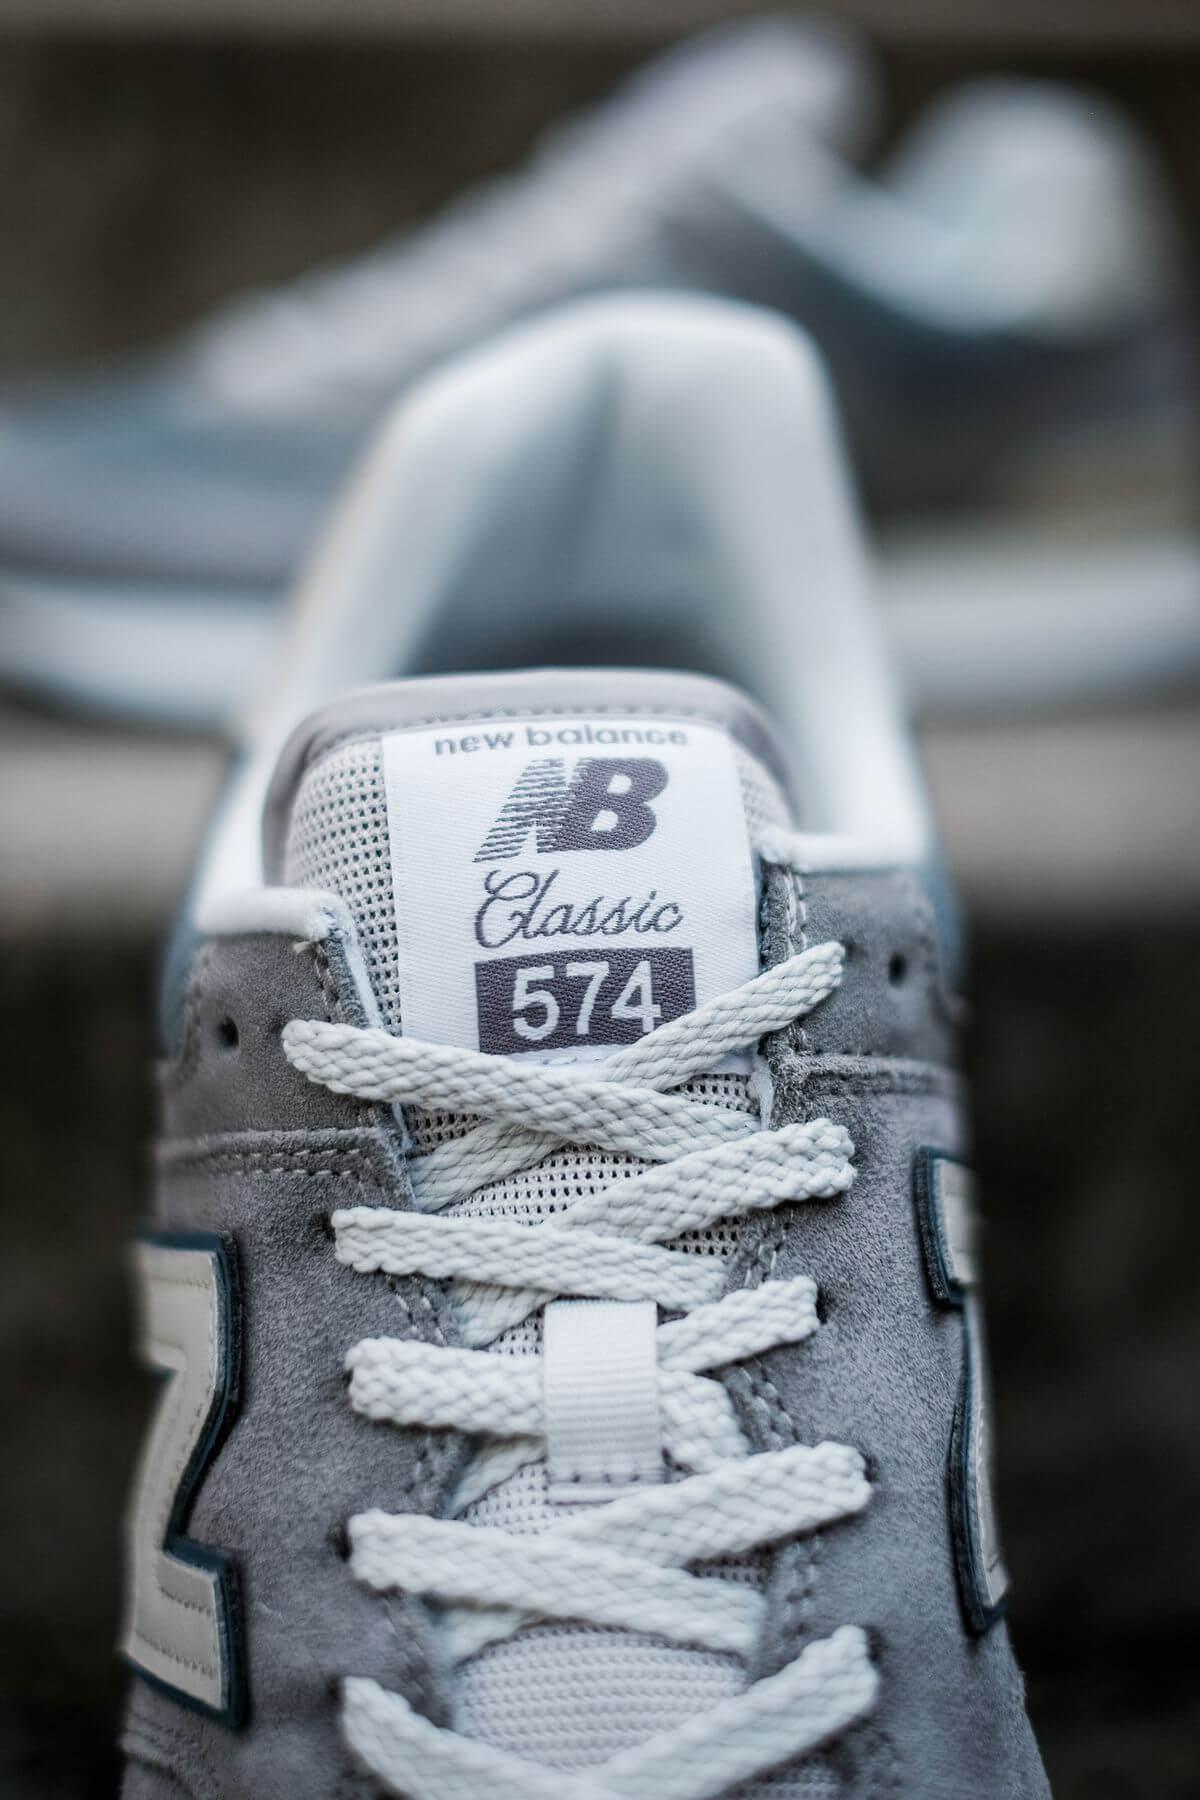 New Balance tongue logo details - New Balance - 574 History Class Pack - ML574BA2 - grey